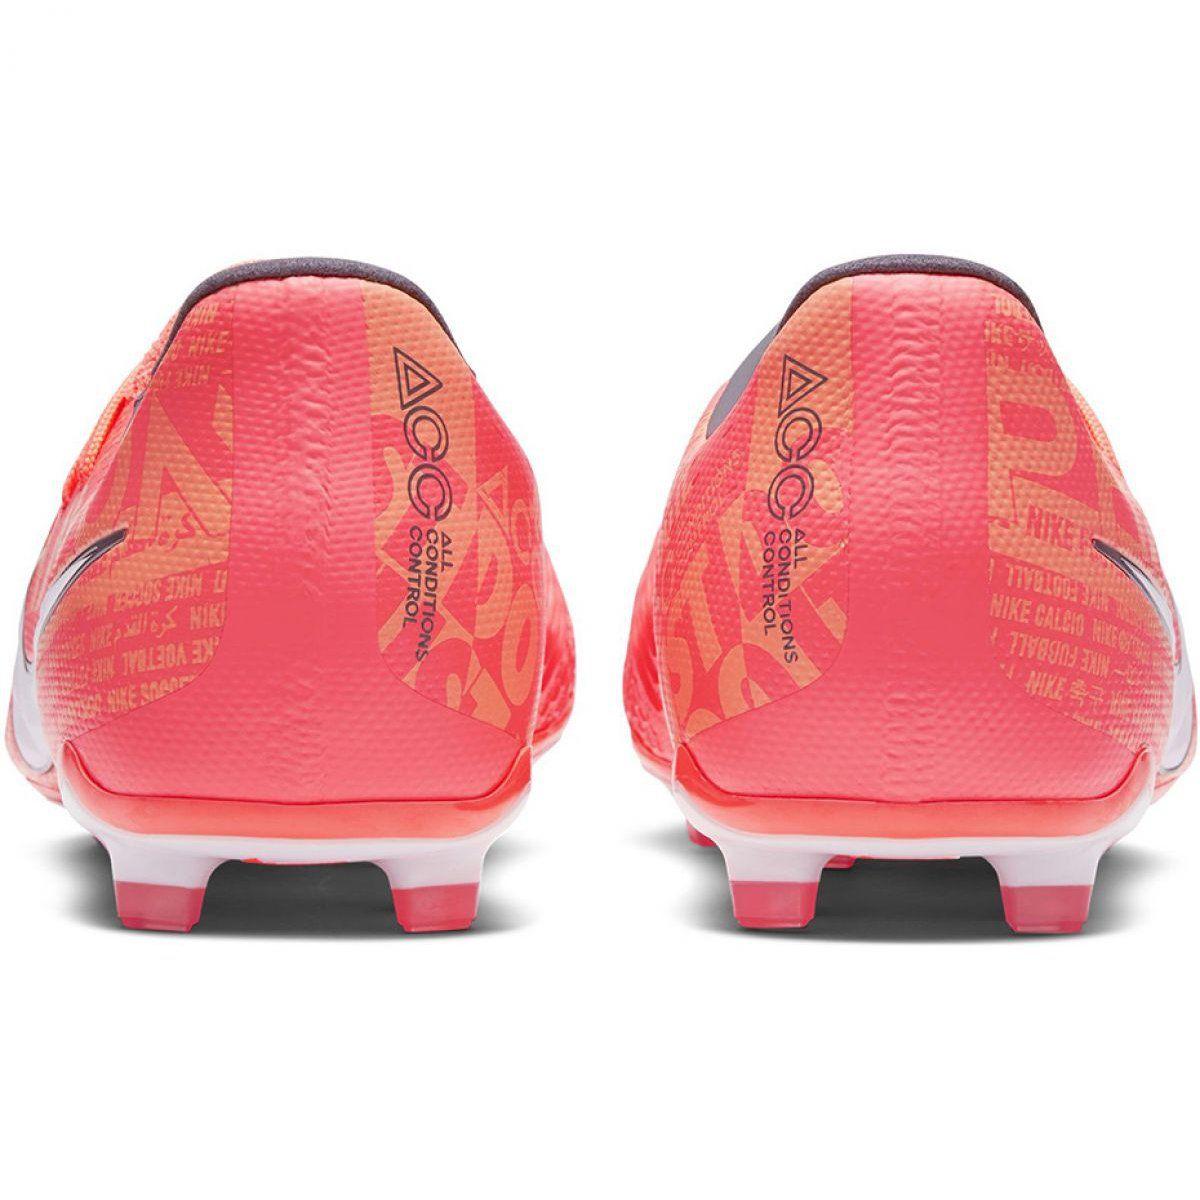 Buty Pilkarskie Nike Phantom Venom Elite Fg Jr Ao0401 810 Pomaranczowe Wielokolorowe Football Shoes Nike Designer Boots